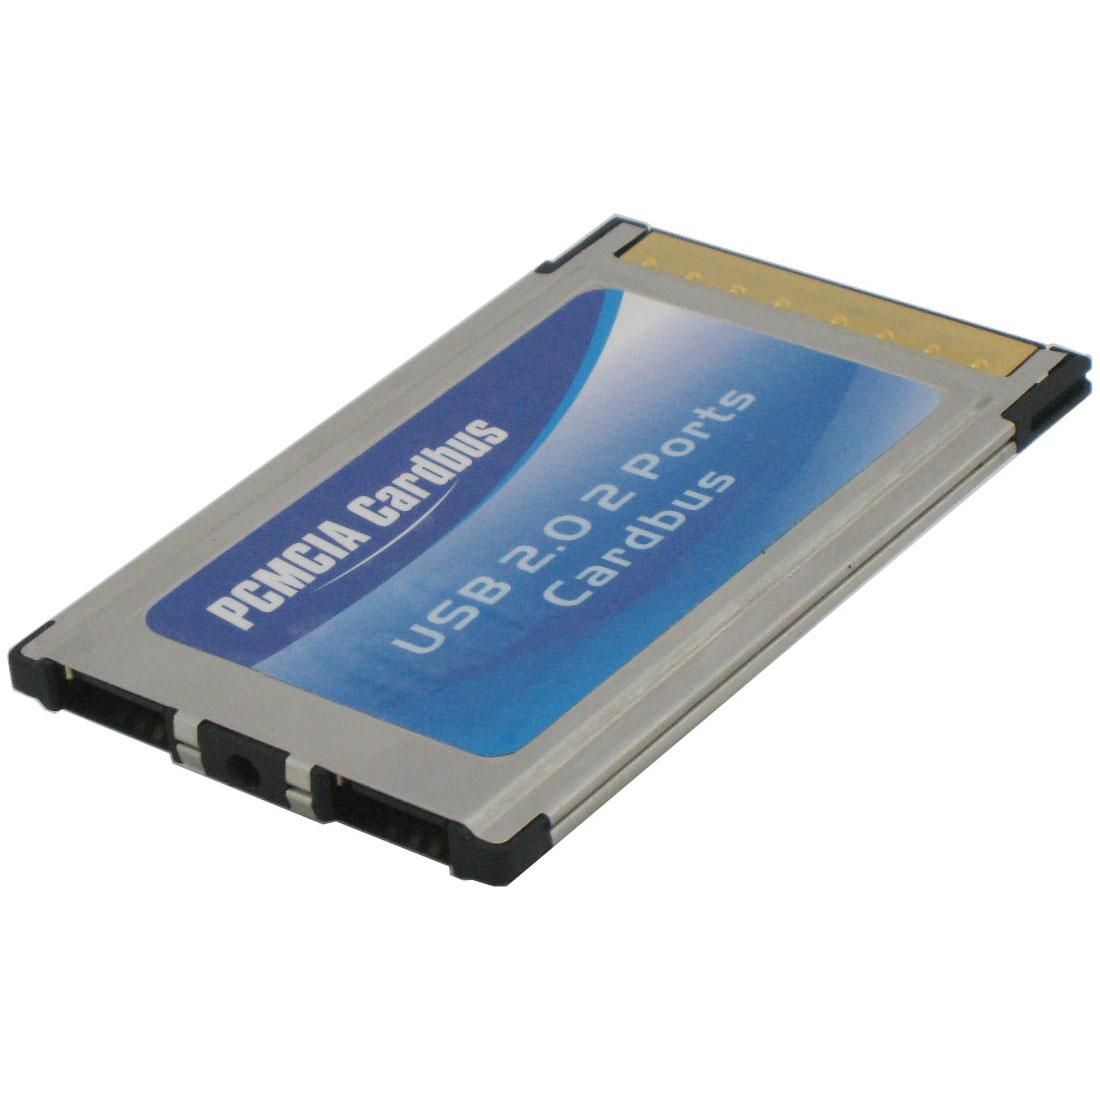 [PITAT-USB] USB2.0端子を2基搭載したCardbus対応PCカード。市場想定価格は1,880円(税込)